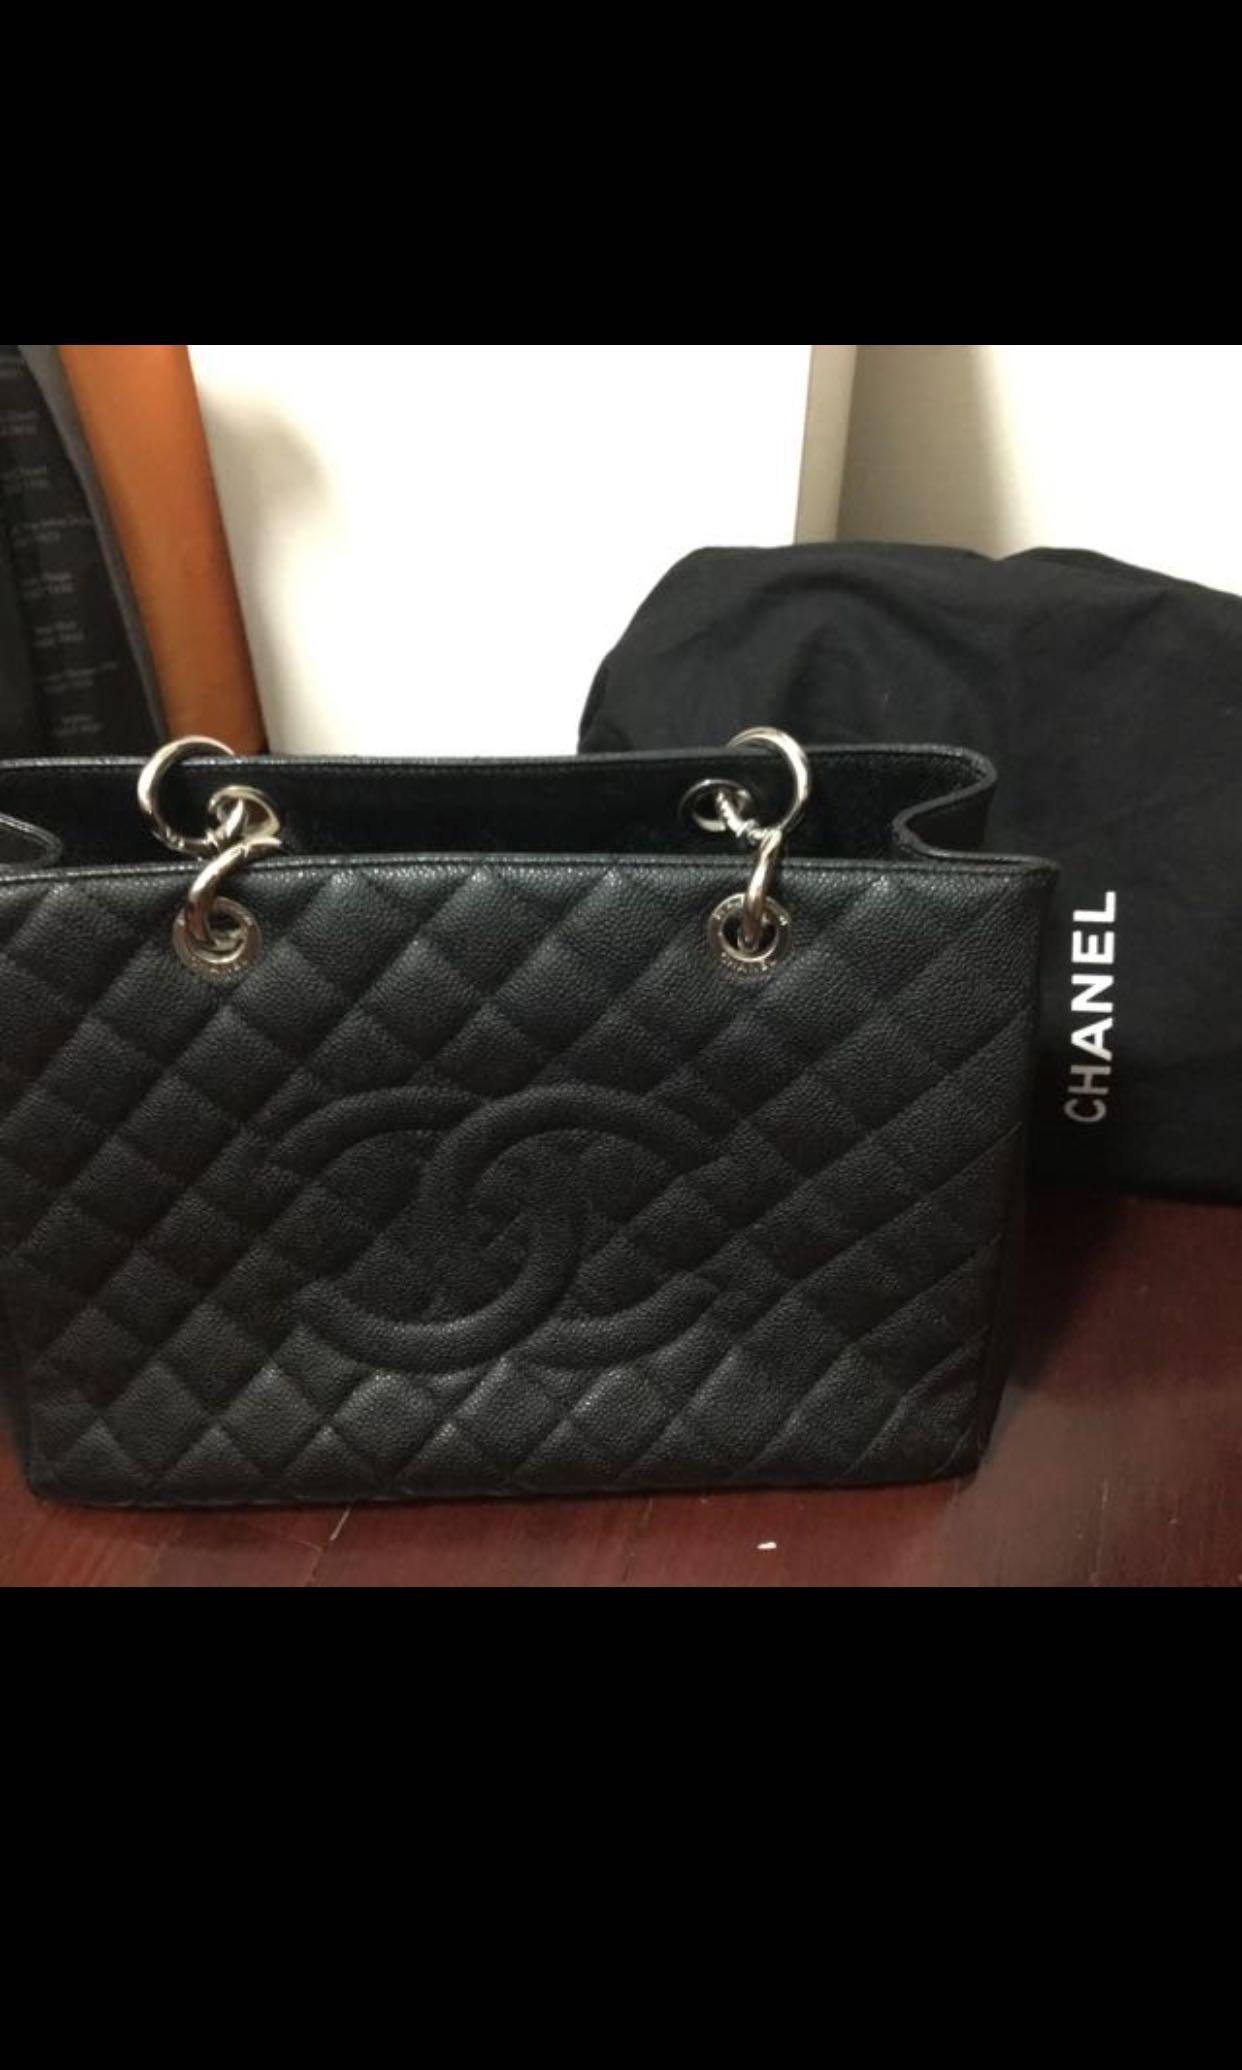 026a39aea5a72b Sale/ Trades- Chanel GST, Women's Fashion, Bags & Wallets, Handbags ...